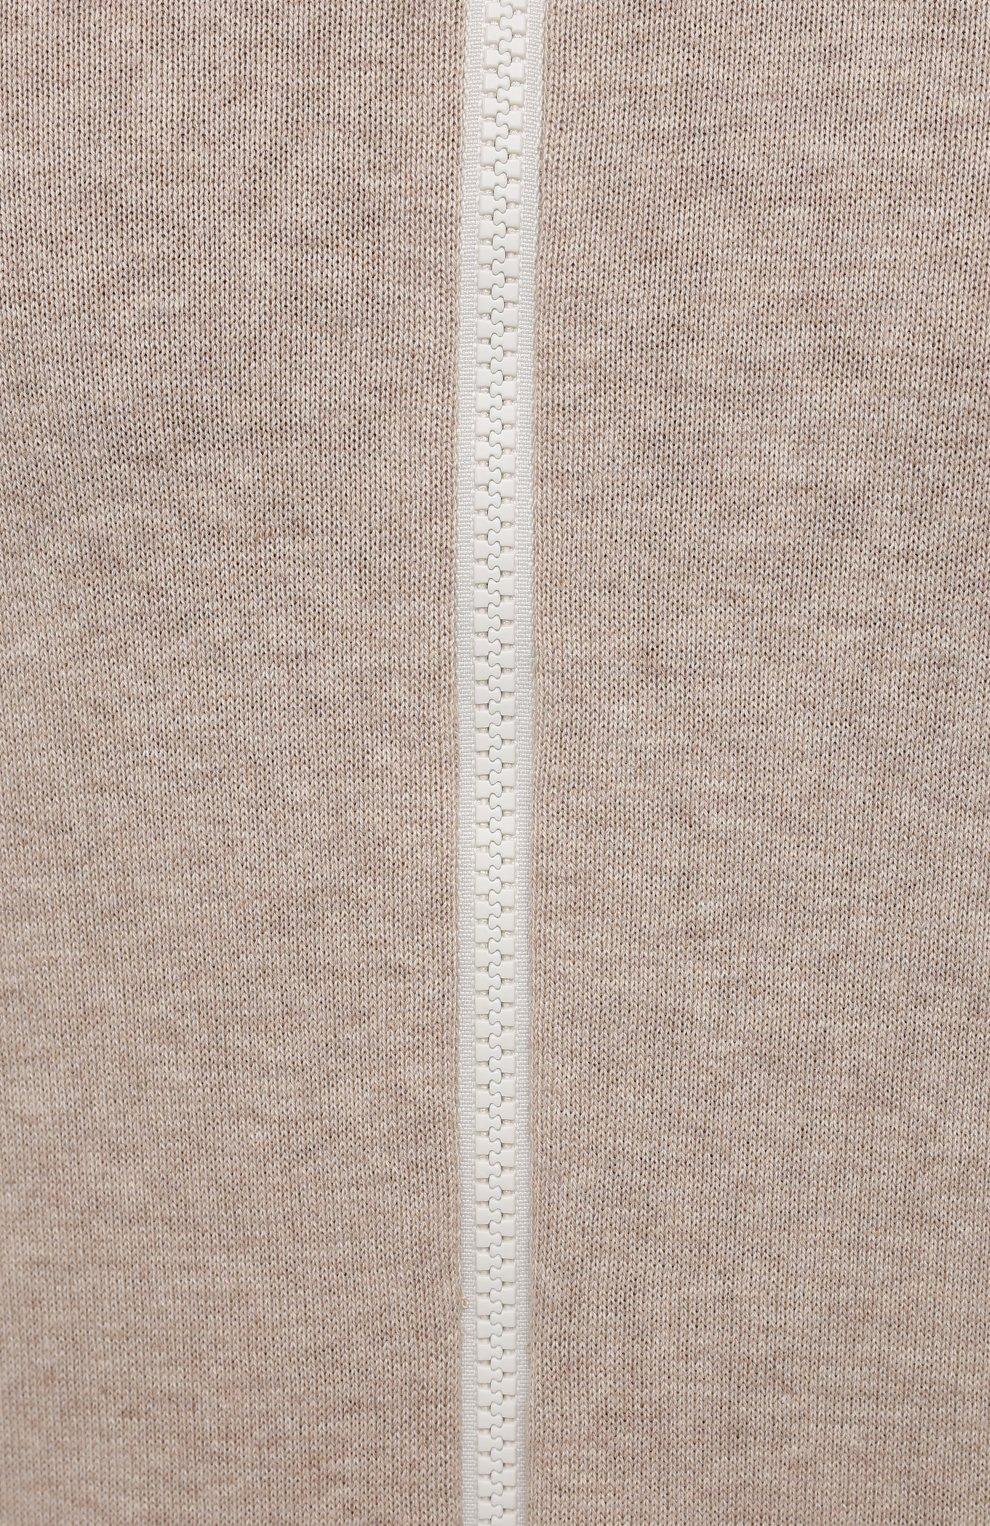 Мужской хлопковый кардиган BRUNELLO CUCINELLI бежевого цвета, арт. M2917906 | Фото 5